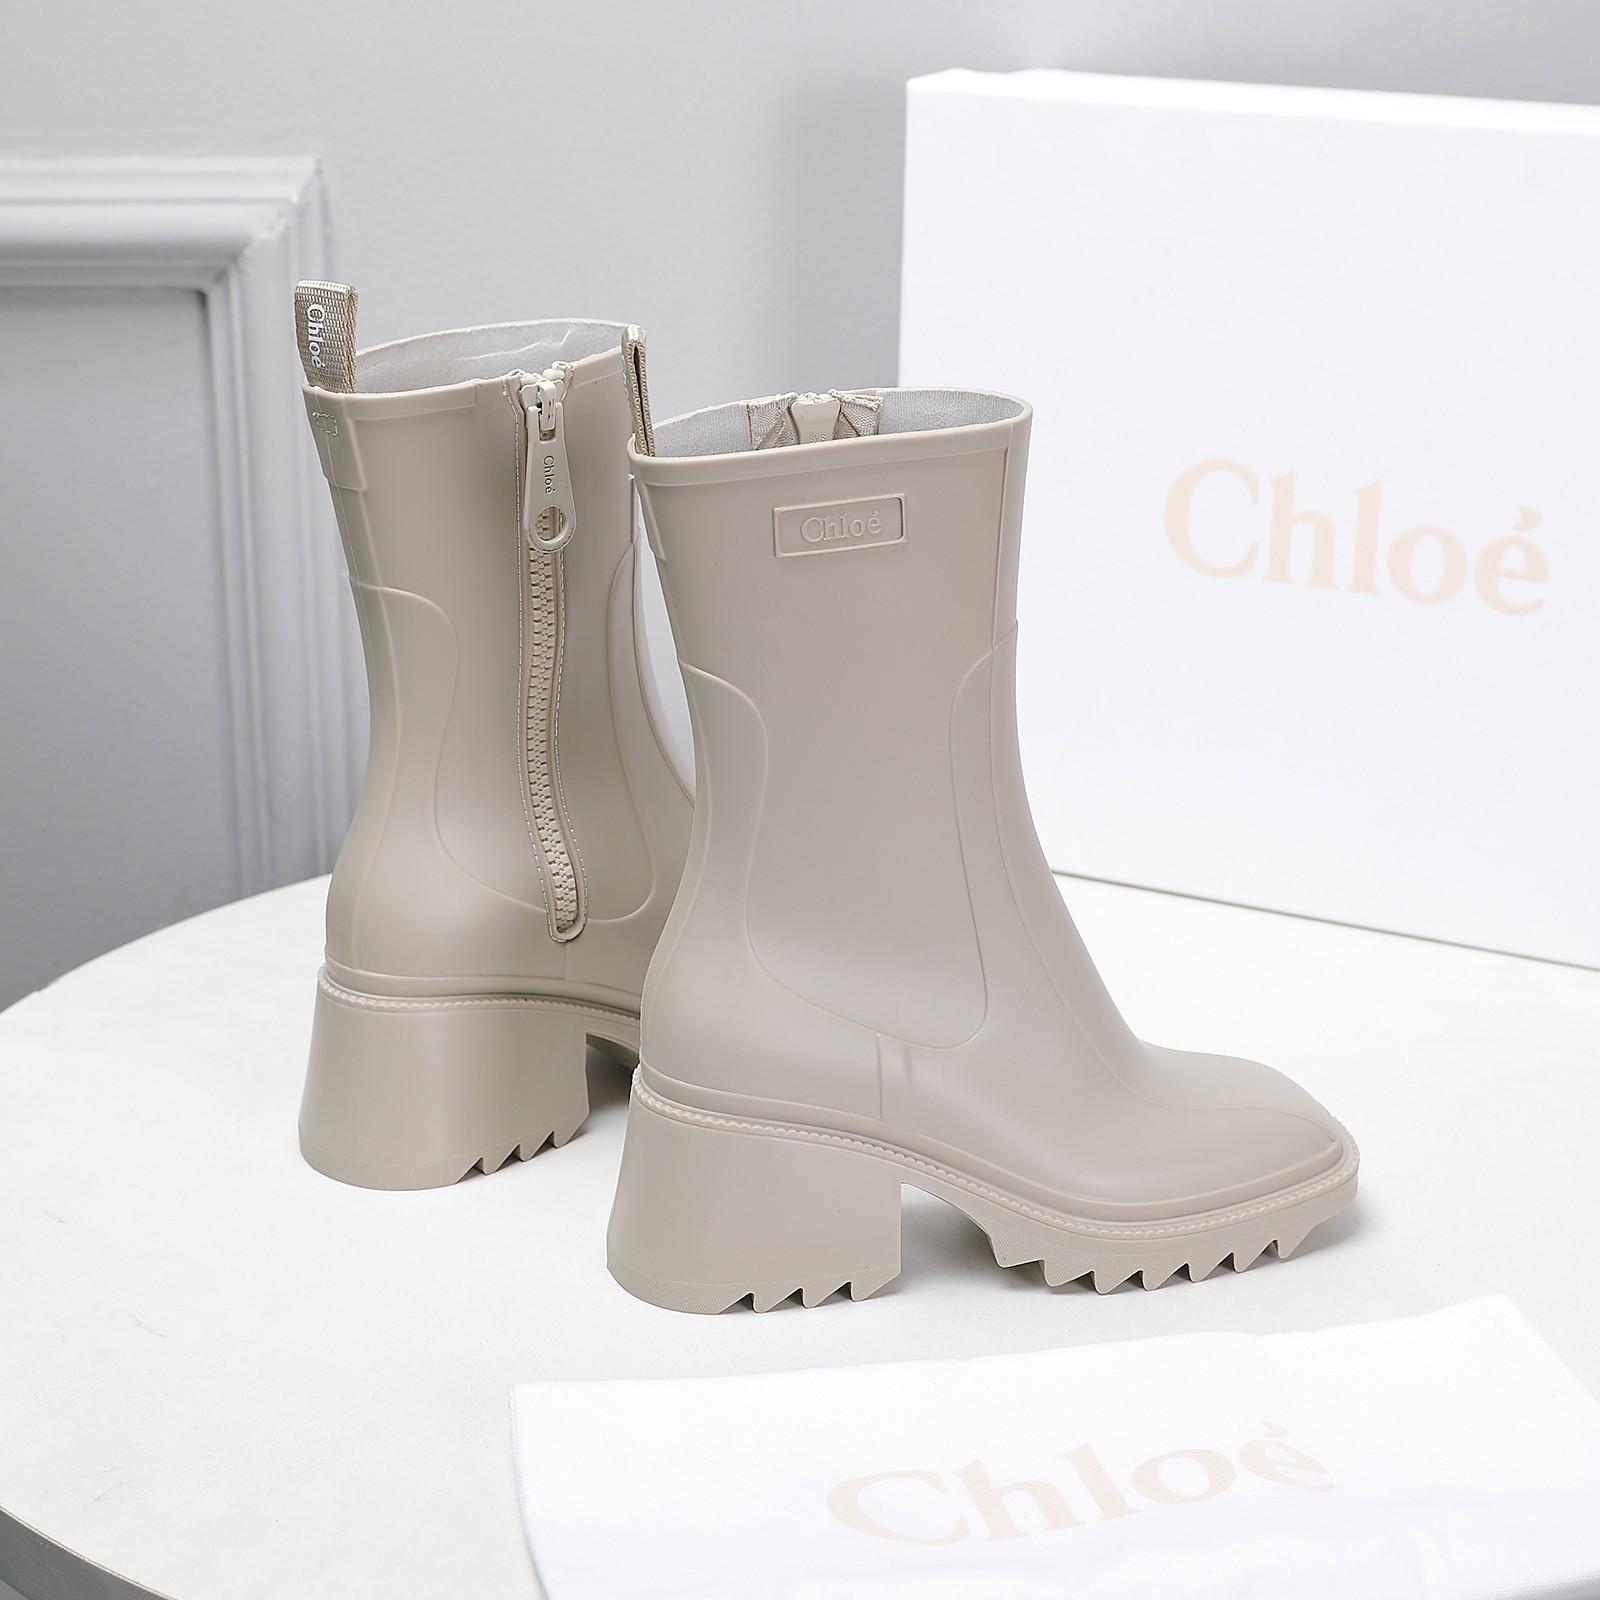 Chloe Betty logo embossed rubber boots Chloe rain boots